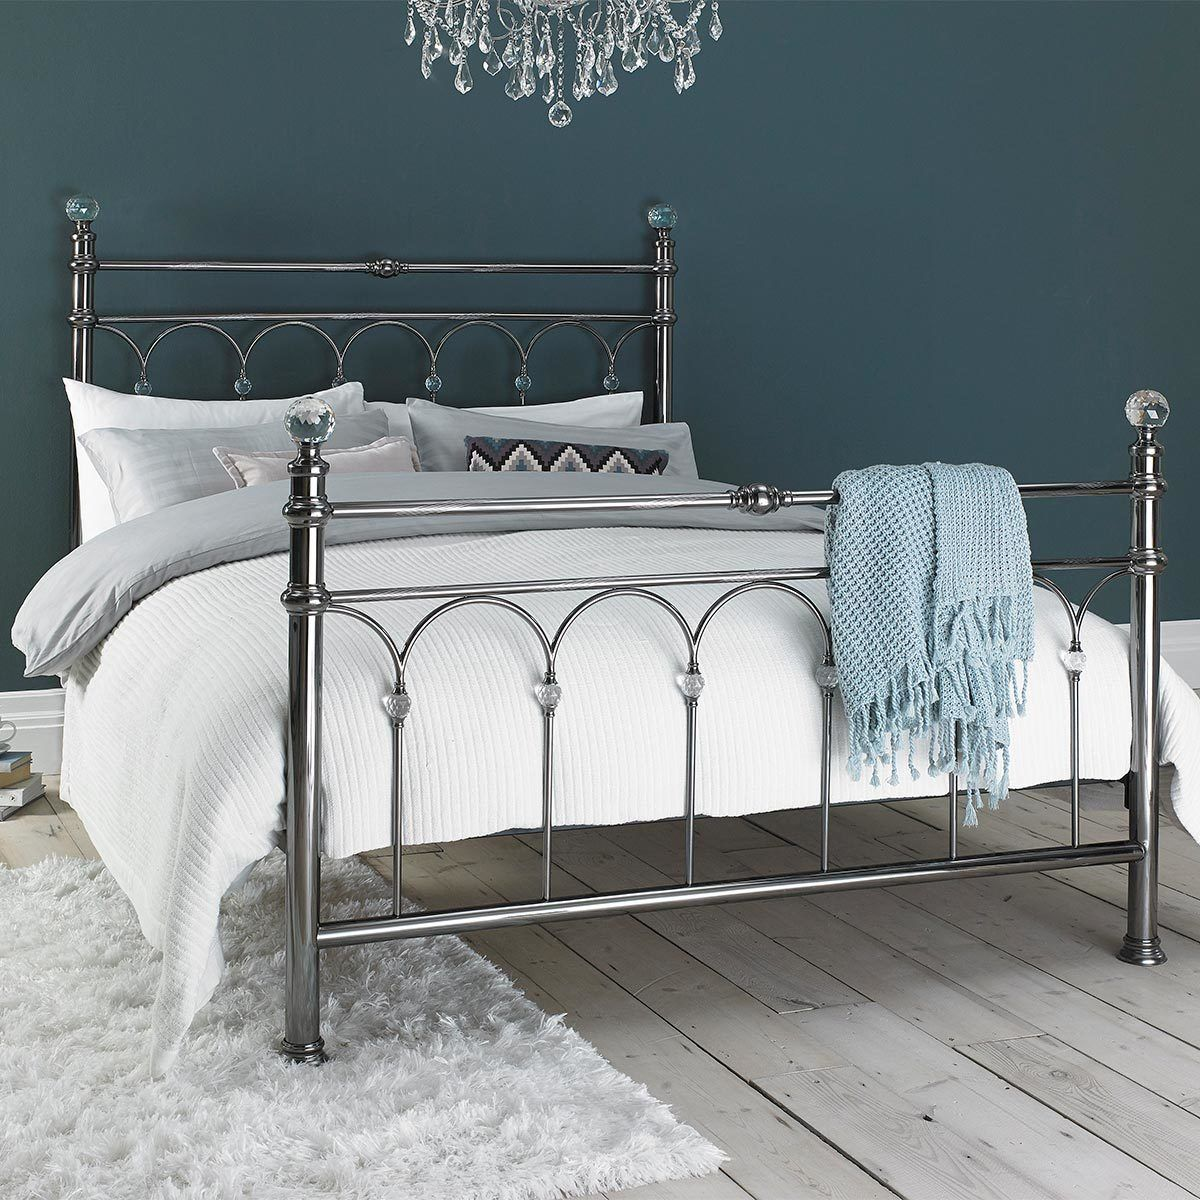 Bentley Cristina Antique Nickel Finish Metal Bed Frame